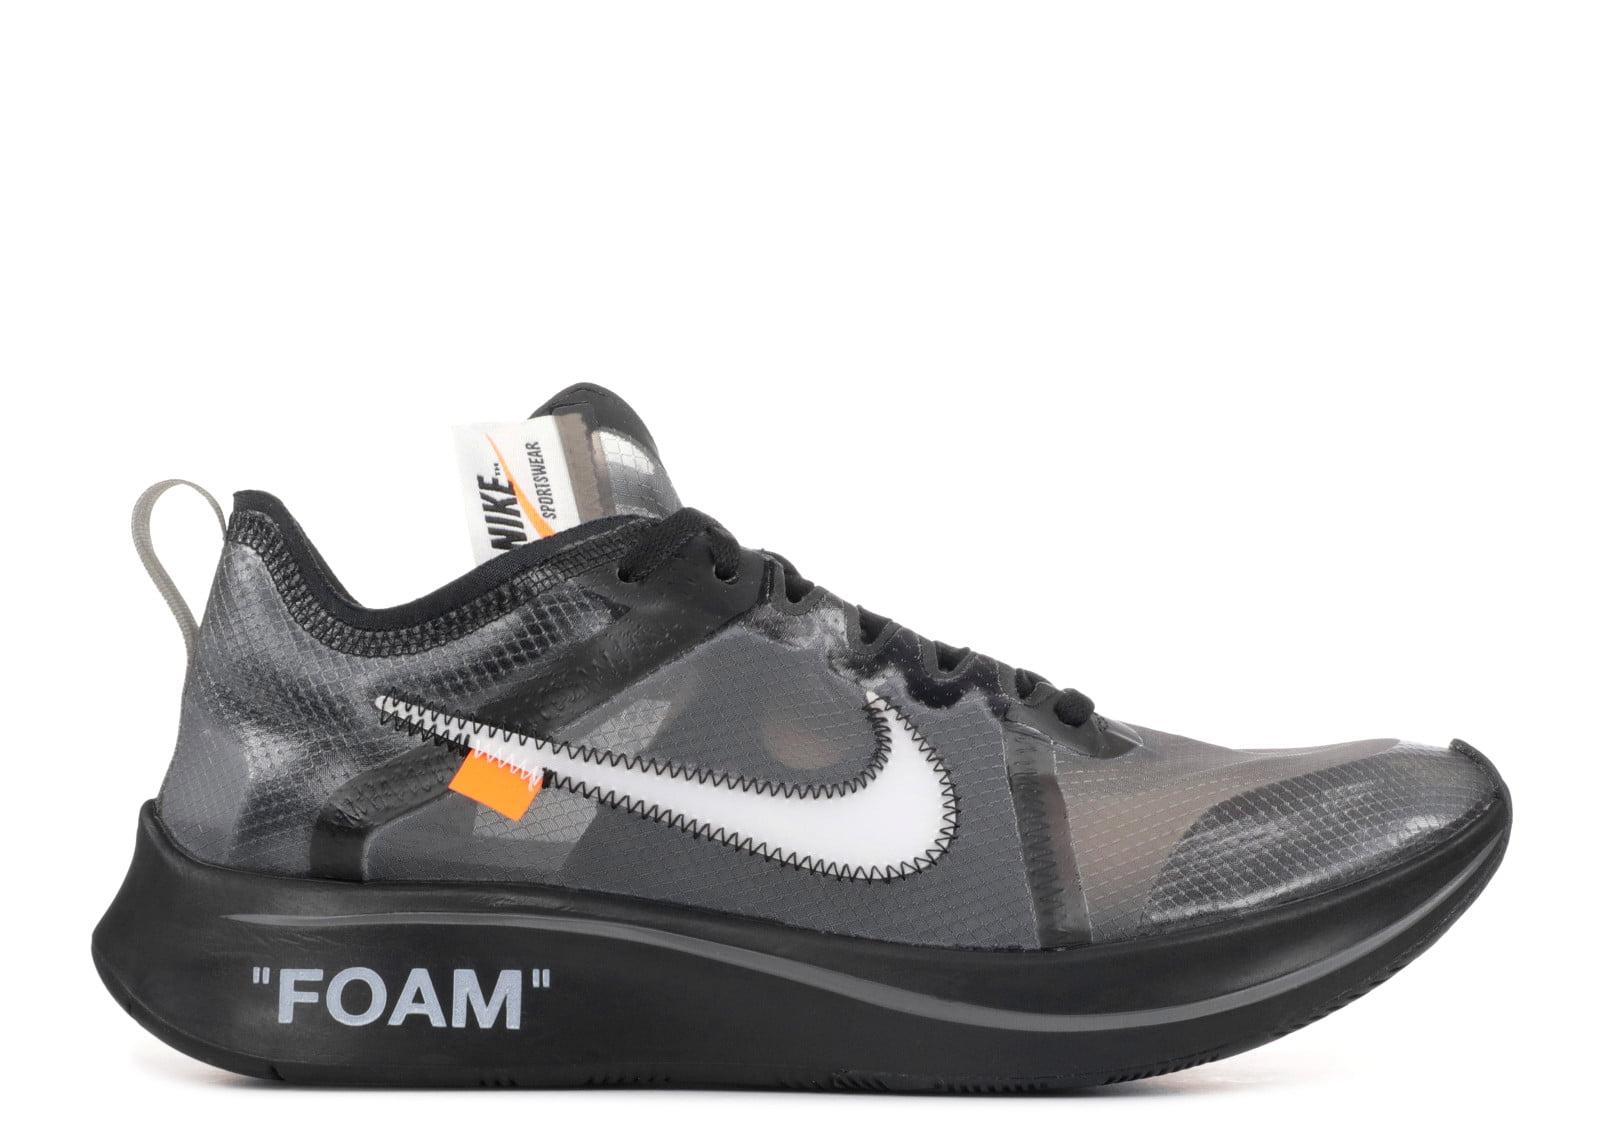 Nike - Men - The 10: Nike Zoom Fly 'Off White' - Aj4588-001 - Size 8